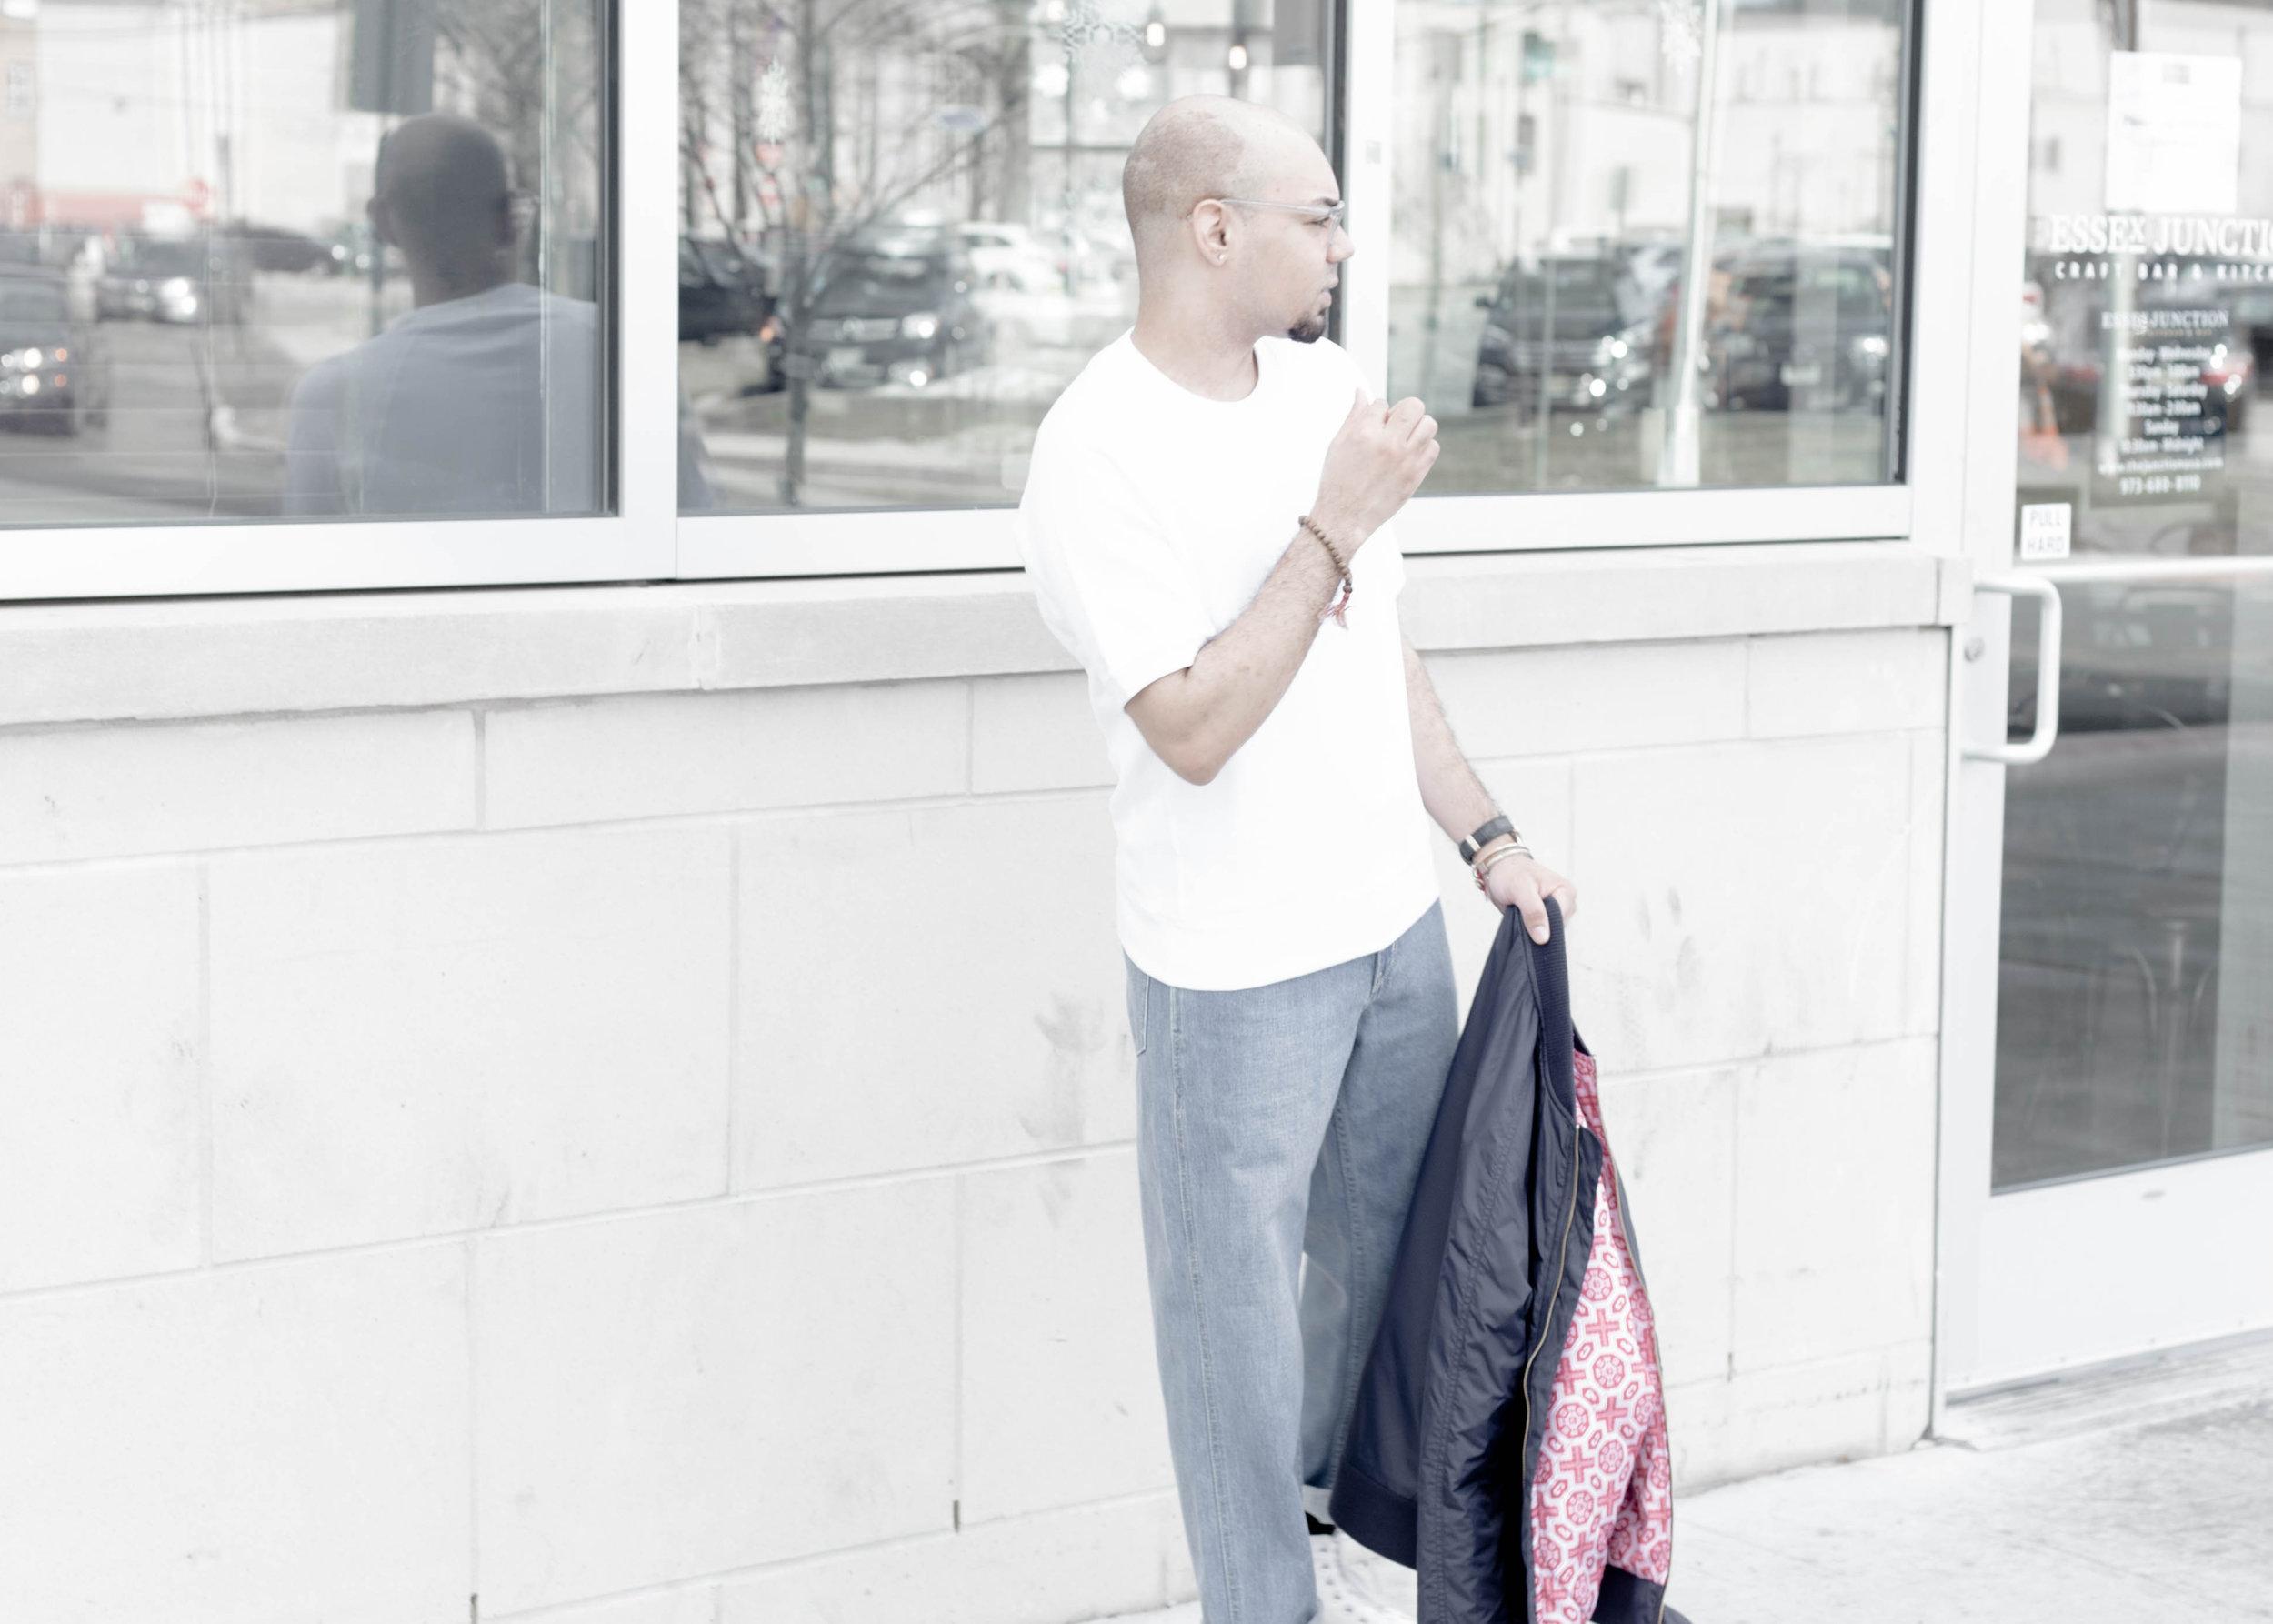 sam-c-perry-short-sleeve-sweatshirt-oversized-relaxed-denim-denim-uniqlo-u-side.jpg